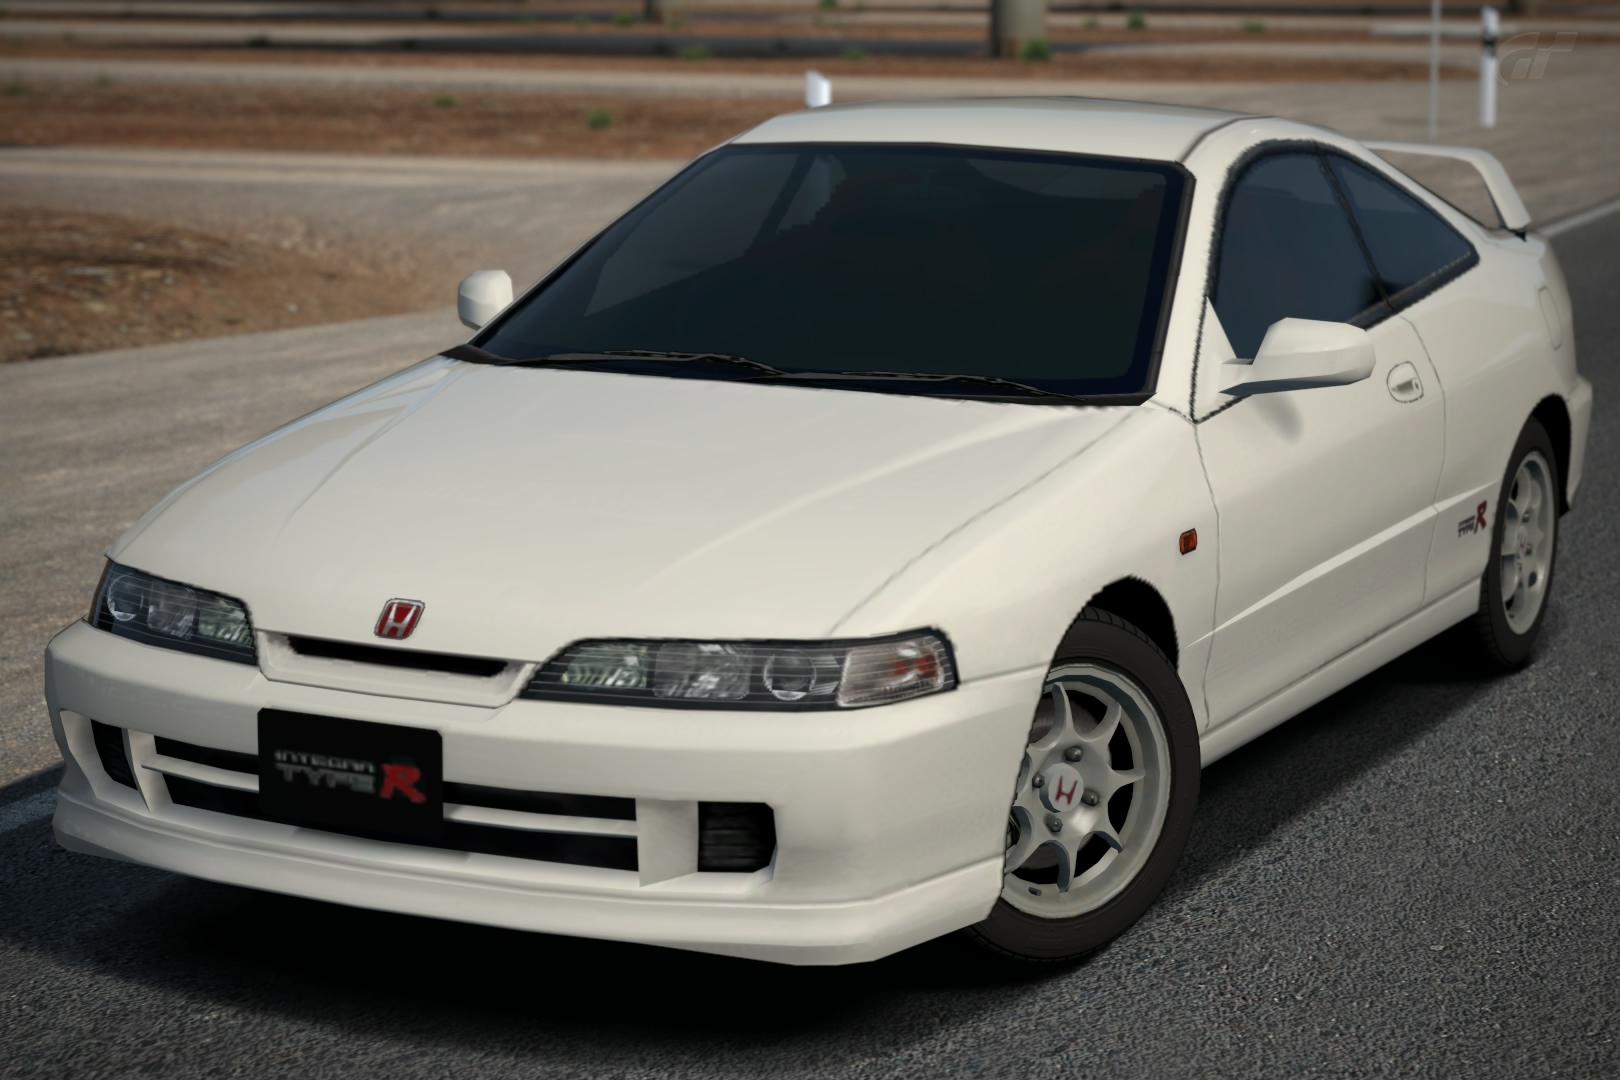 Honda Integra Type R Dc2 95 Gran Turismo Wiki Fandom